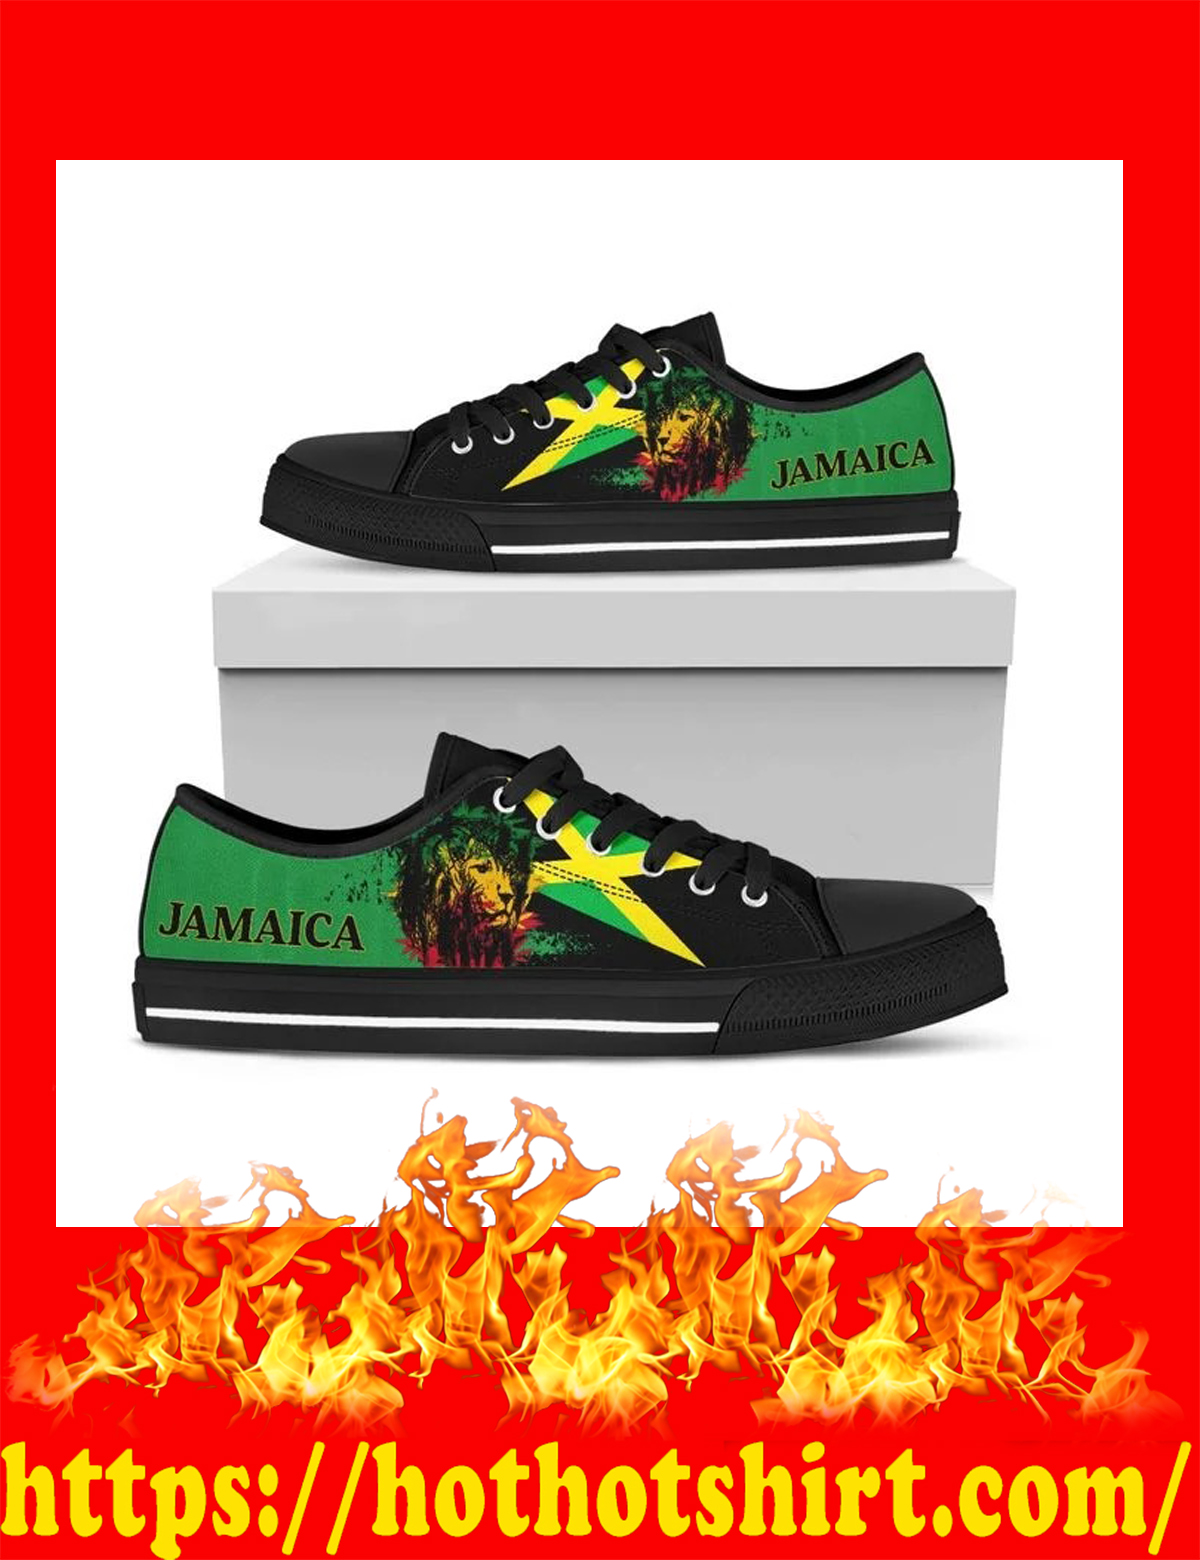 Lion flag jamaica low top shoes - pic 1